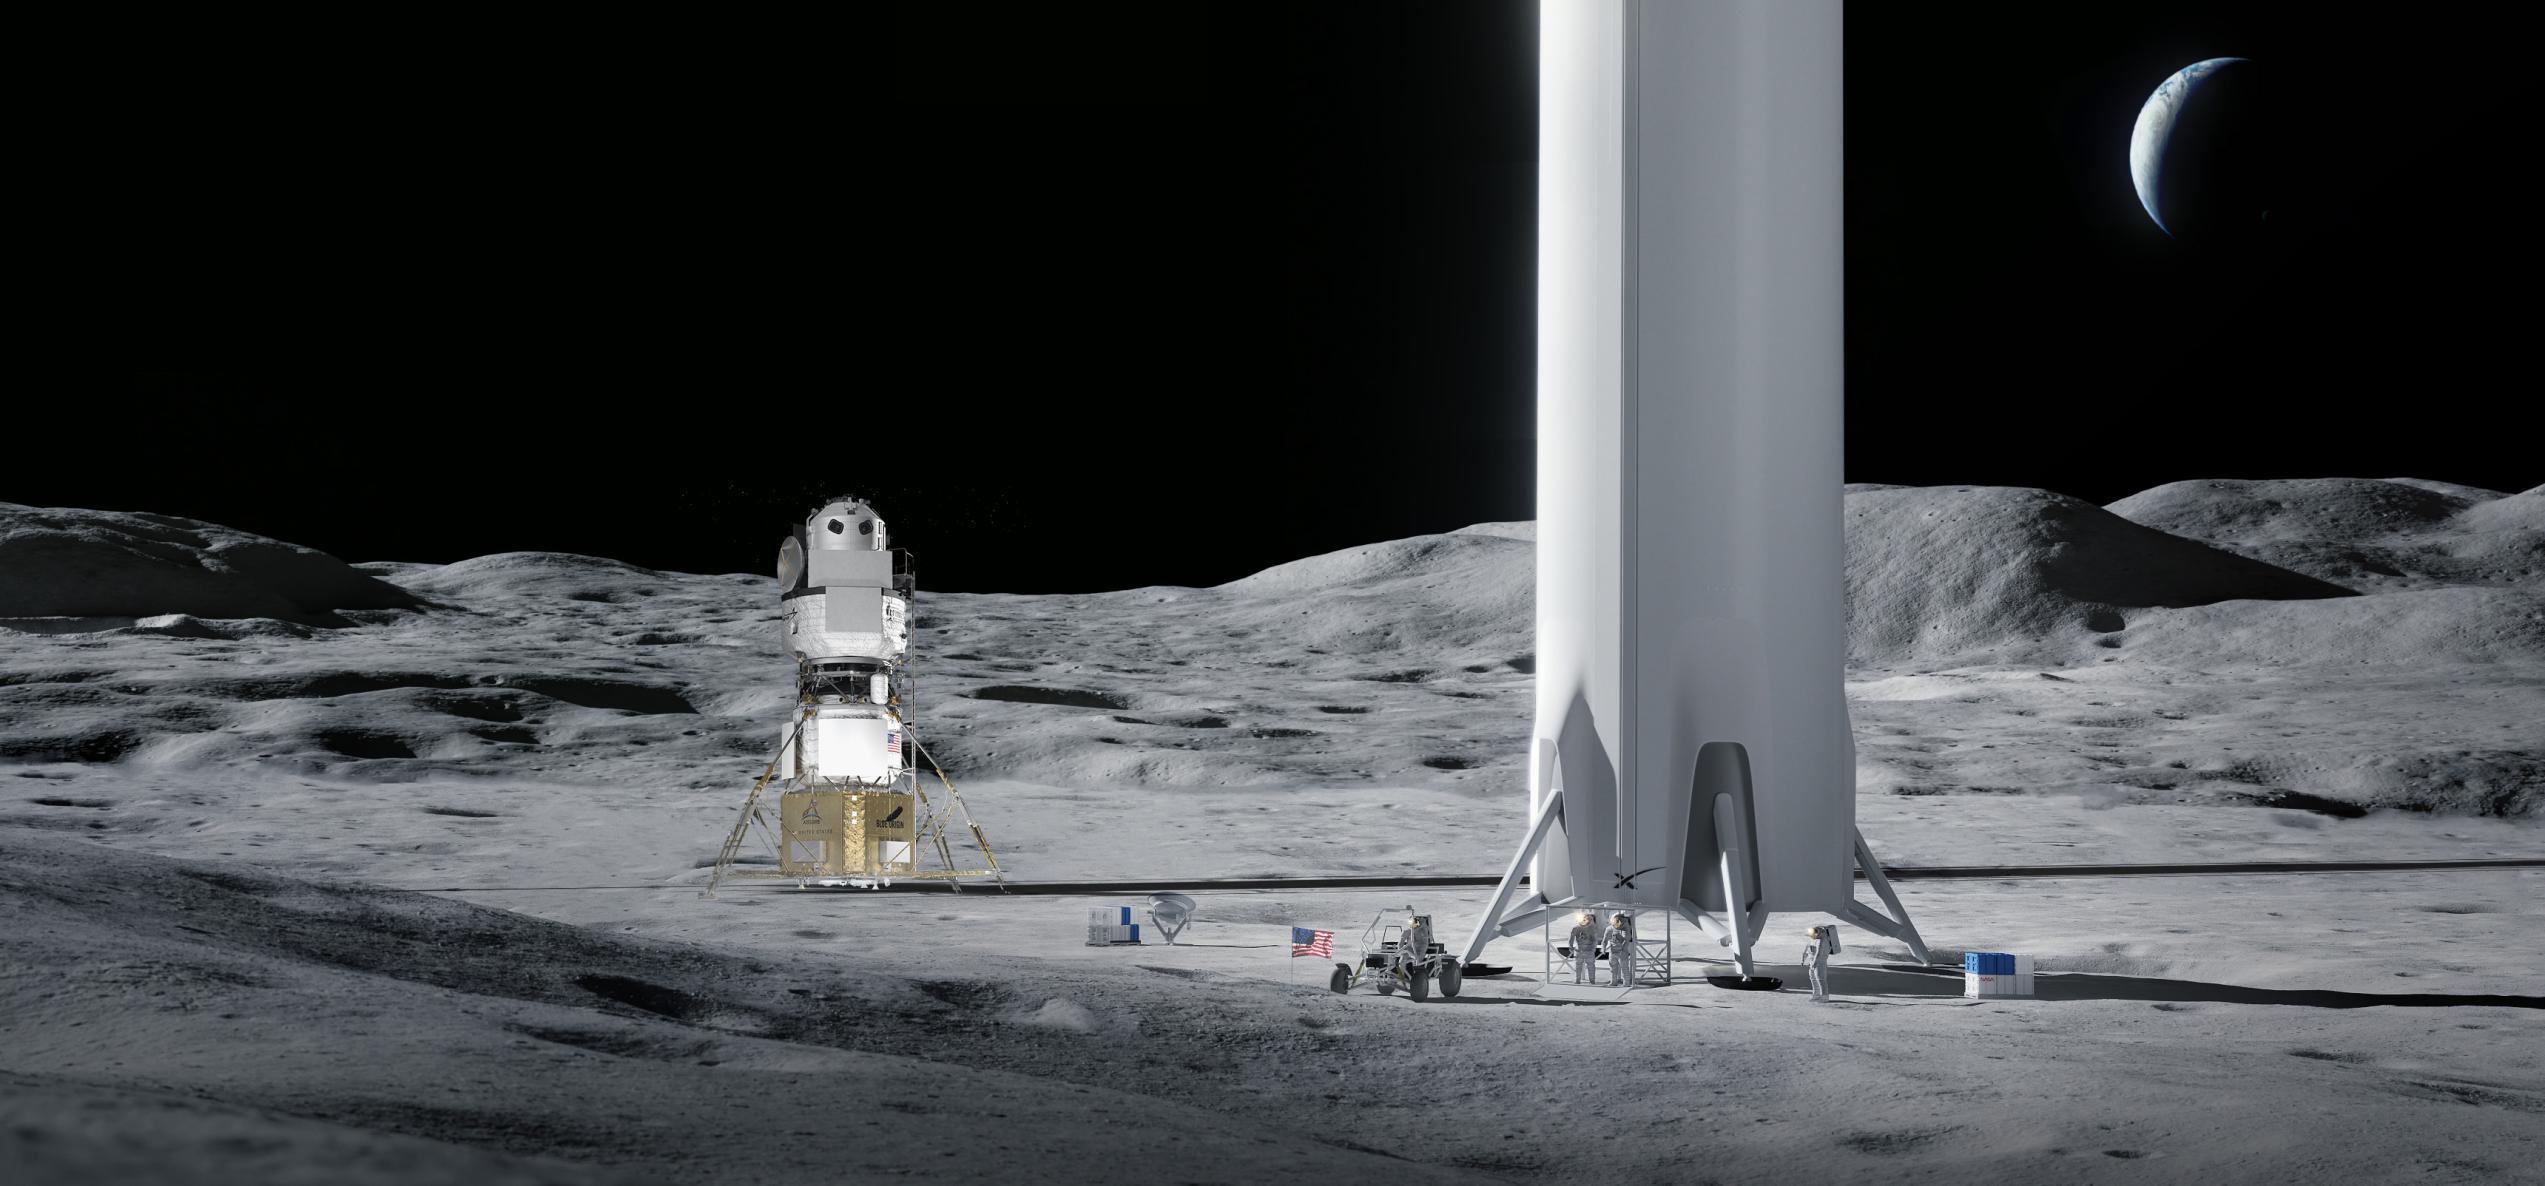 SpaceX CEO Elon Musk explains why Blue Origin's Starship lawsuit makes no sense